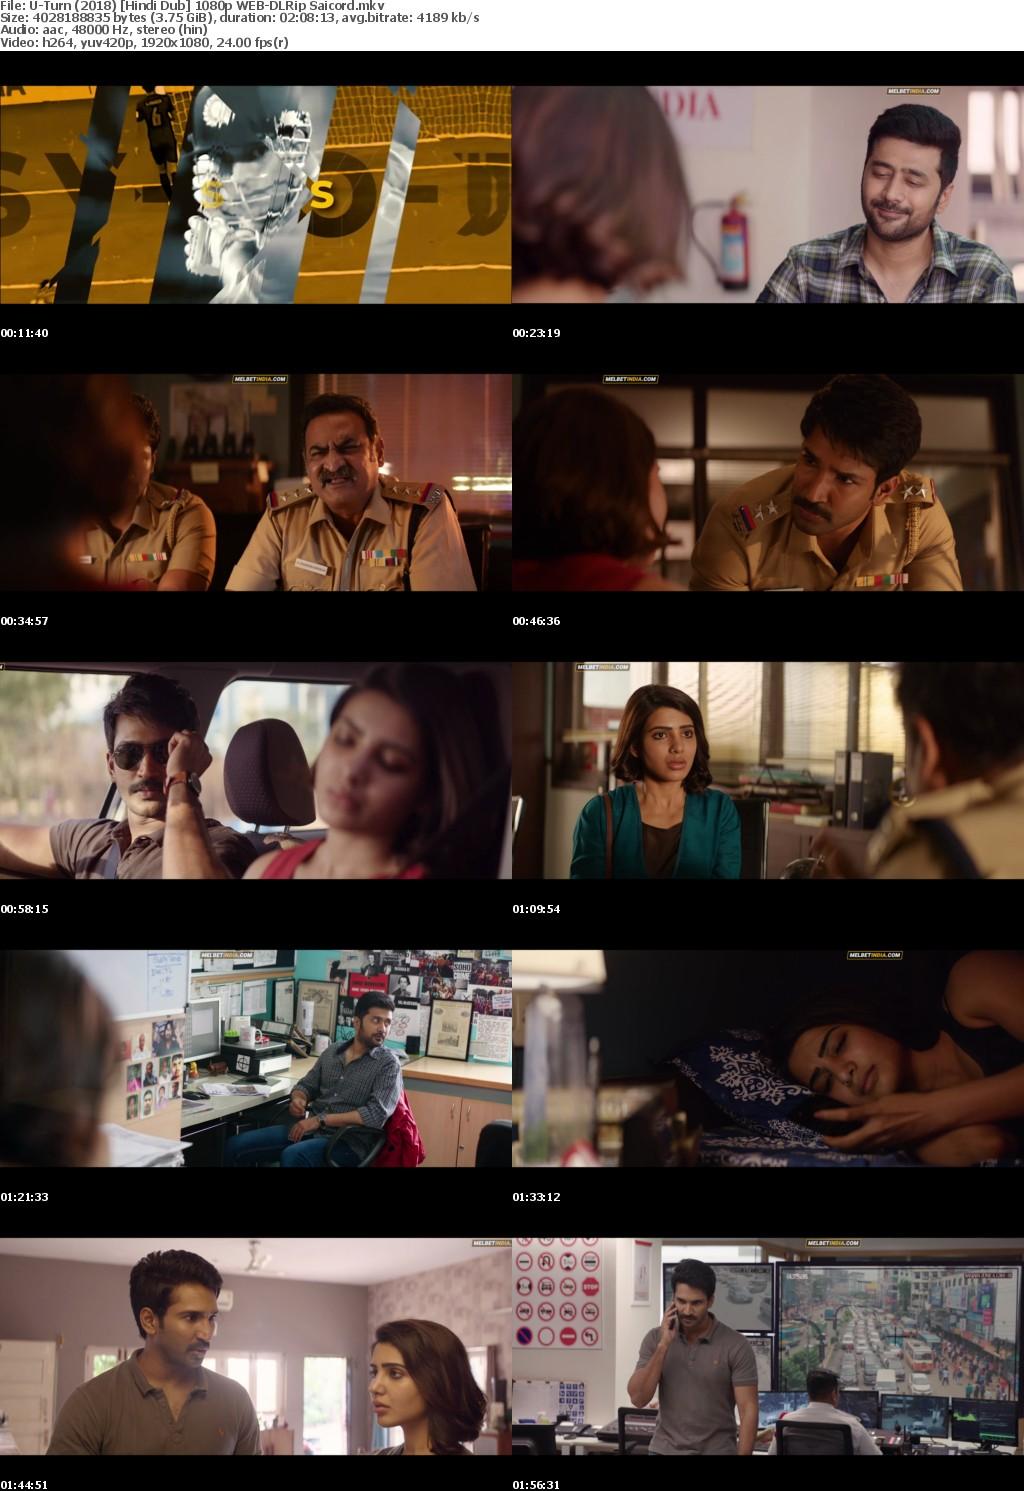 U-Turn (2018) Hindi Dub 1080p WEB-DLRip Saicord